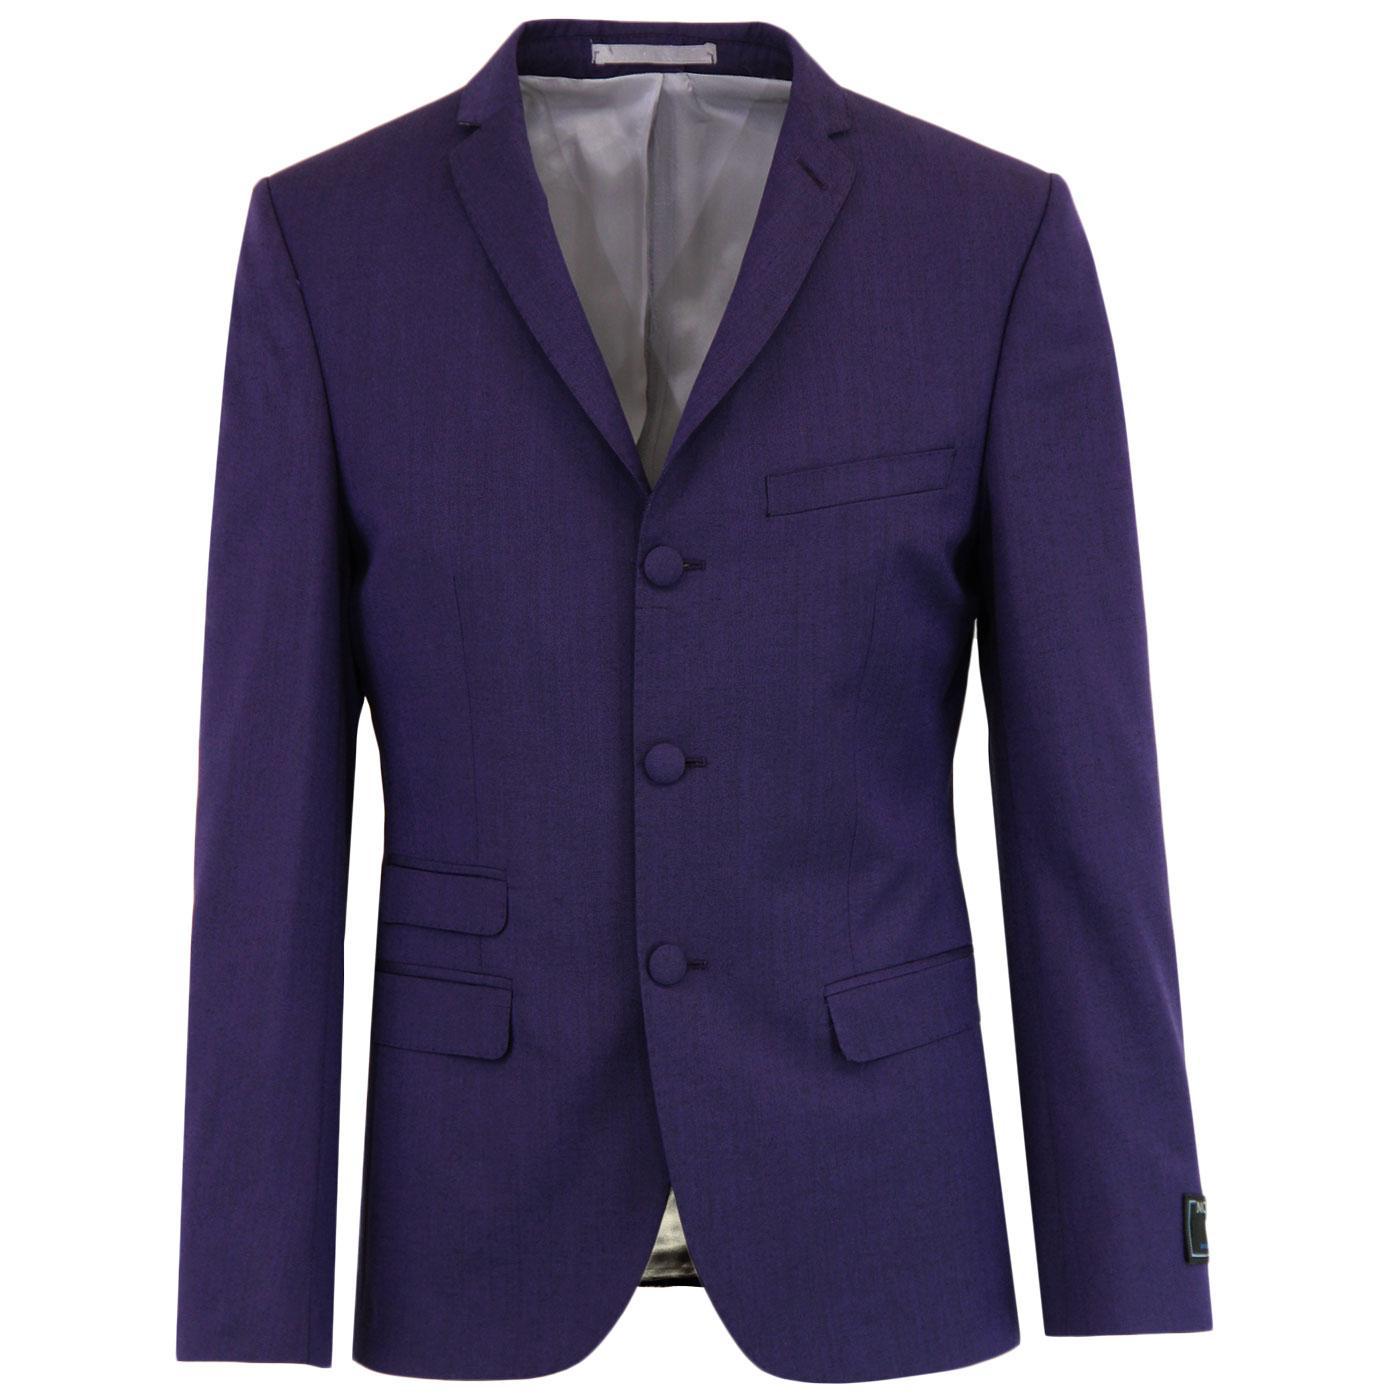 MADCAP ENGLAND Mod Mohair Tonic Suit Blazer PURPLE